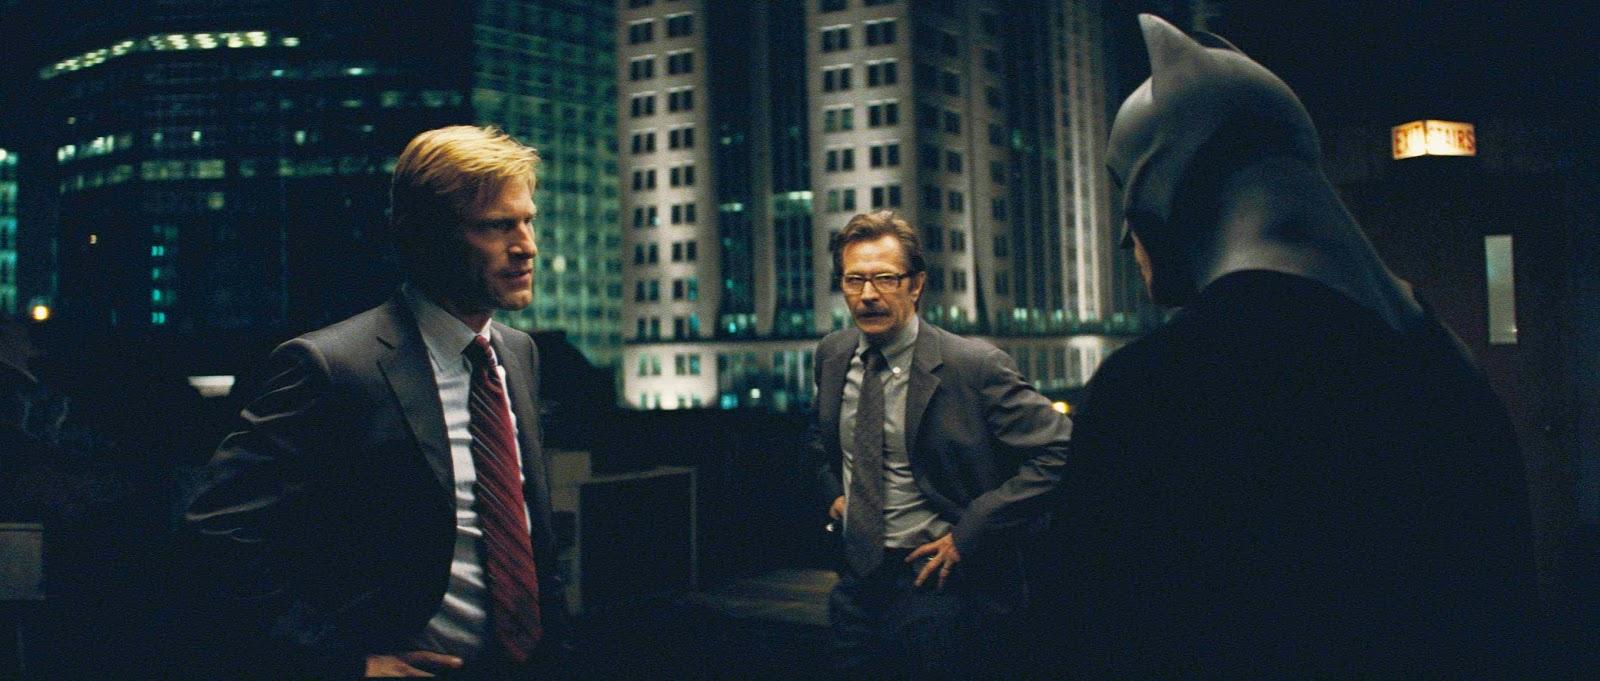 Review dan Sinopsis Film The Dark Knight (2008)